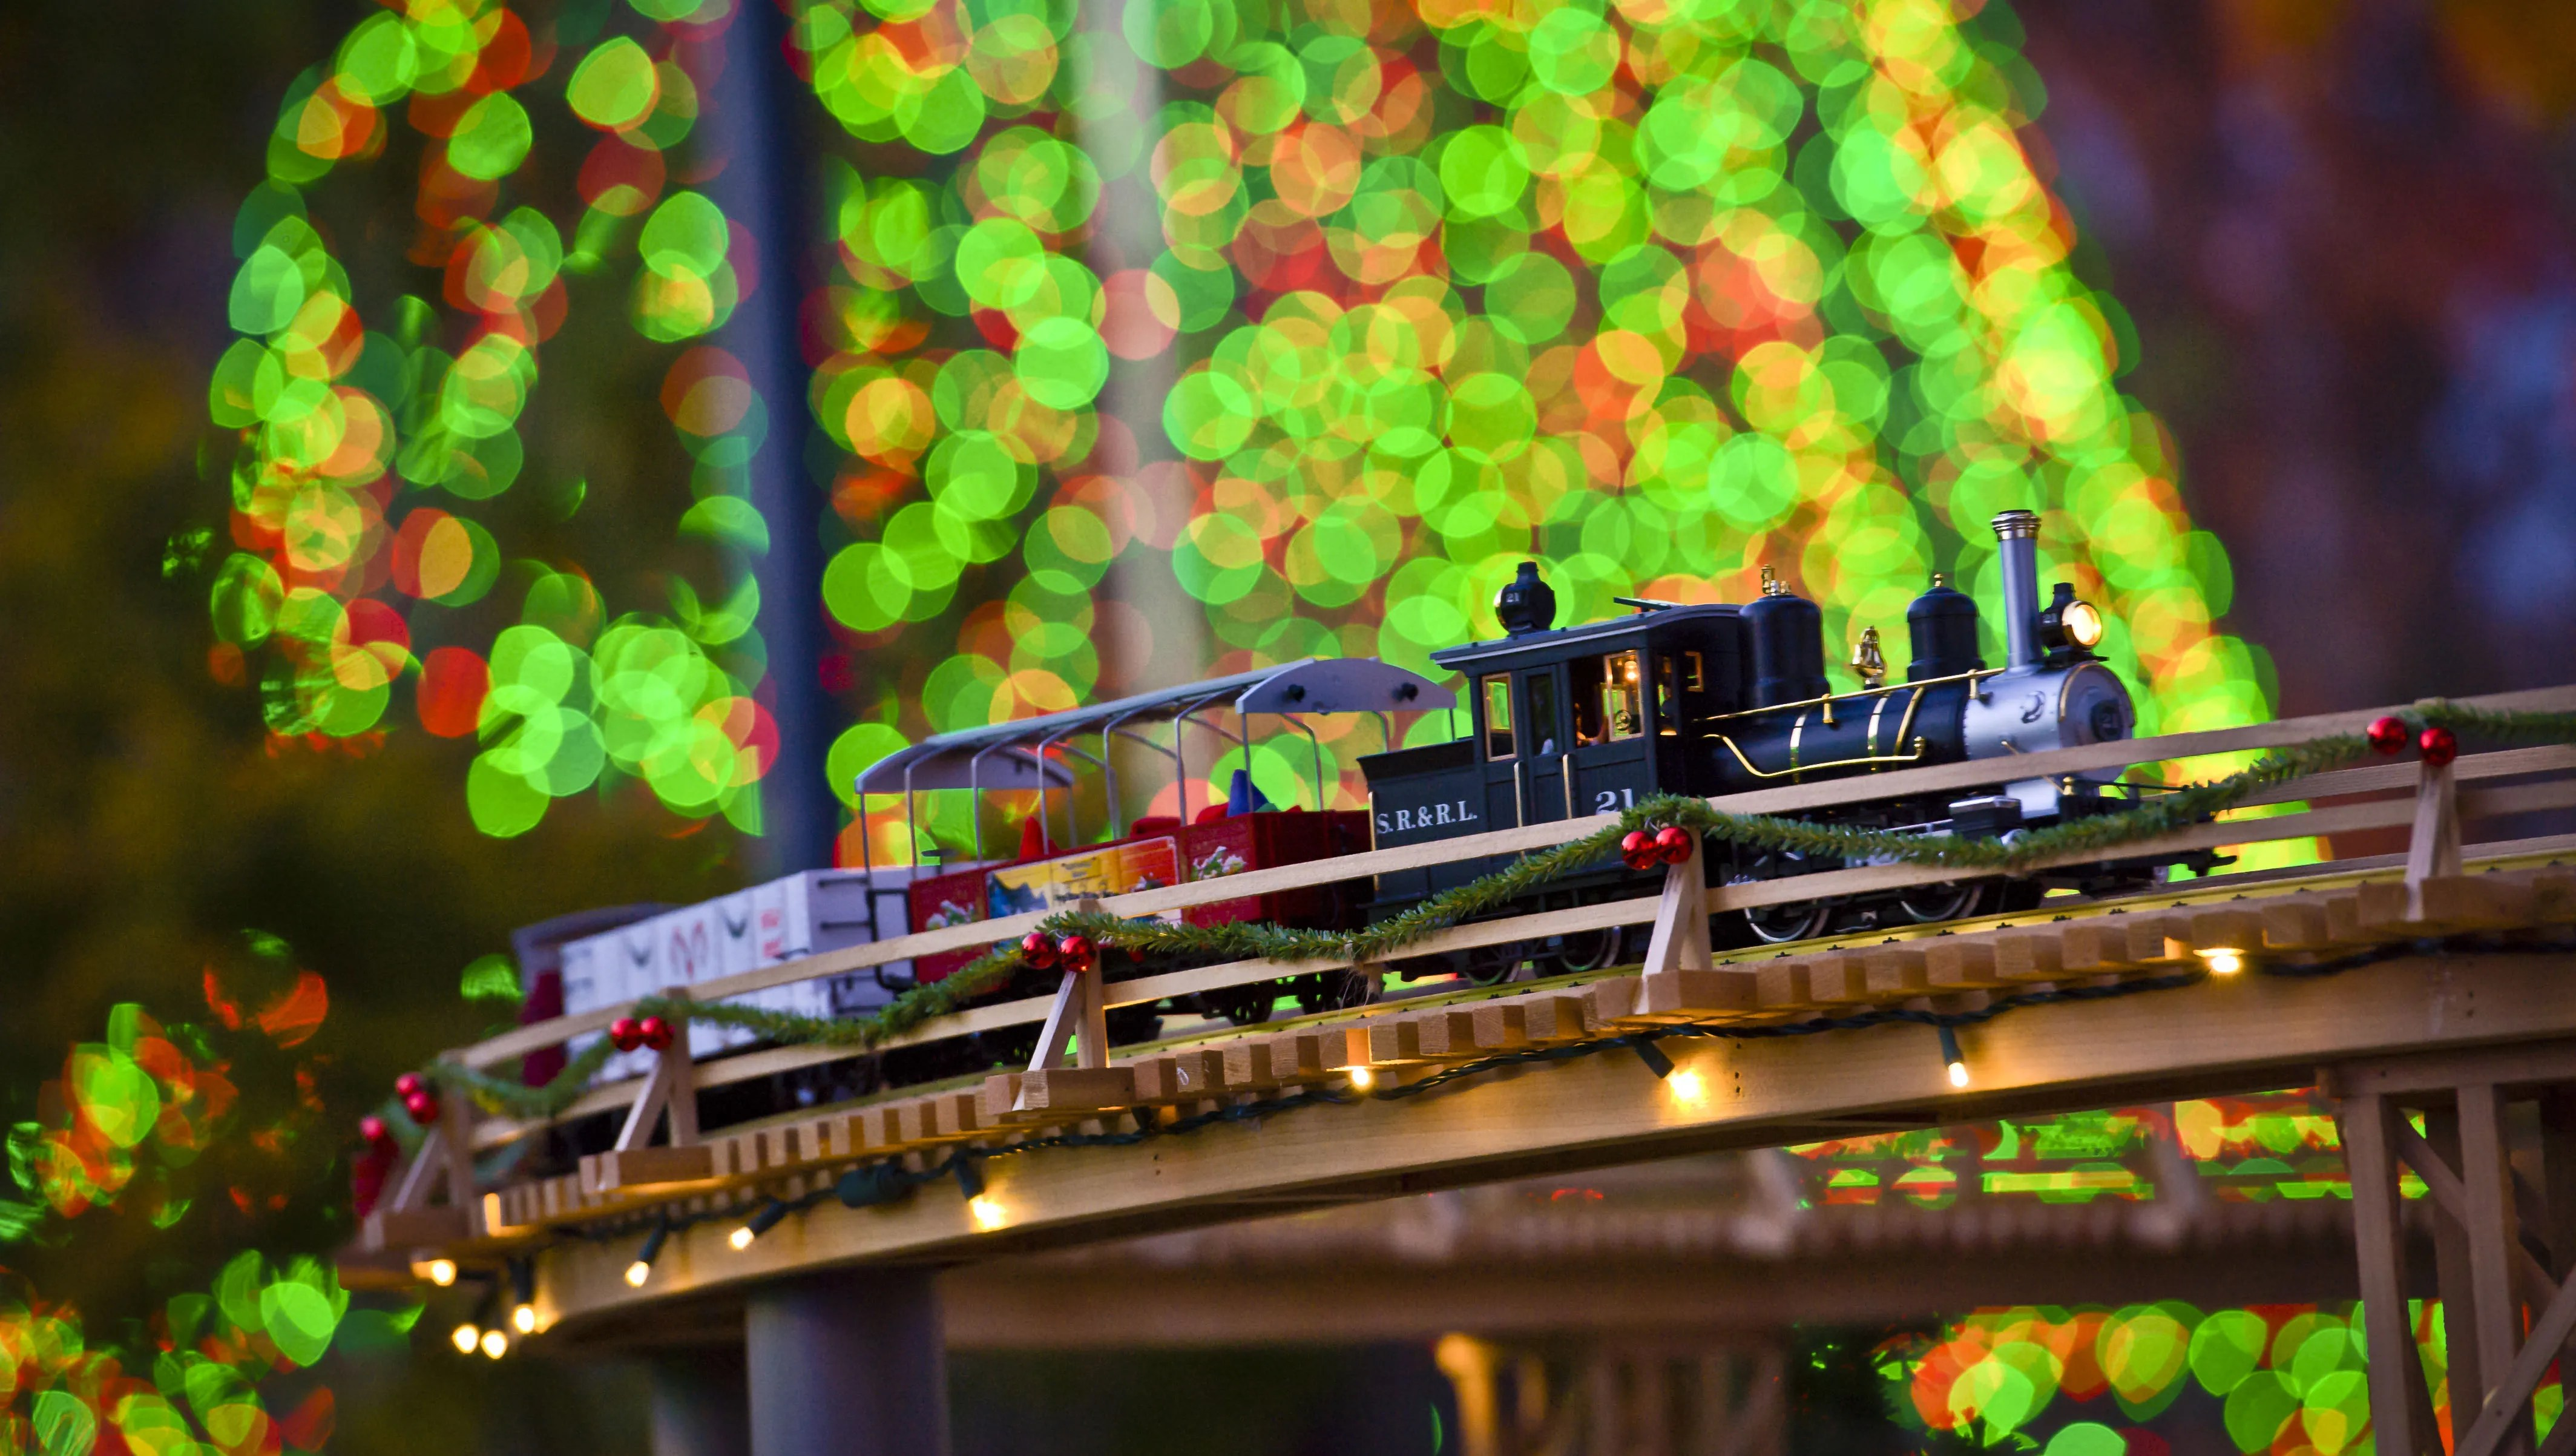 Atlanta Holiday Model Train Display